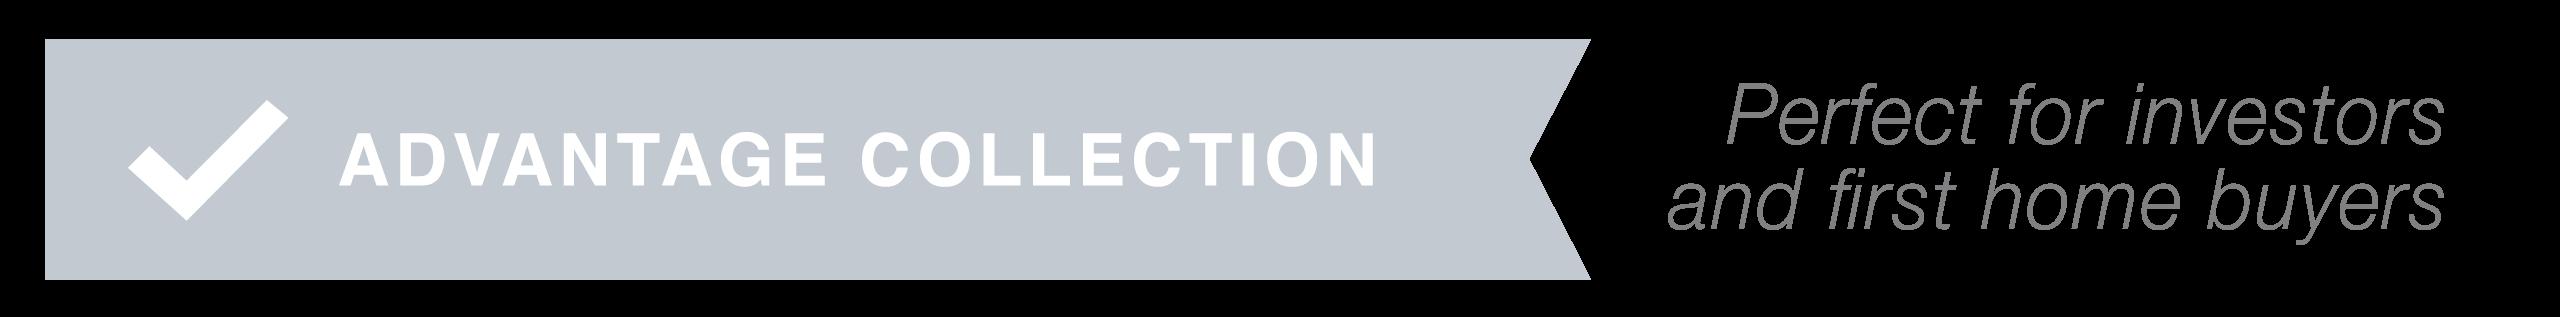 adv_collection_banner_v2